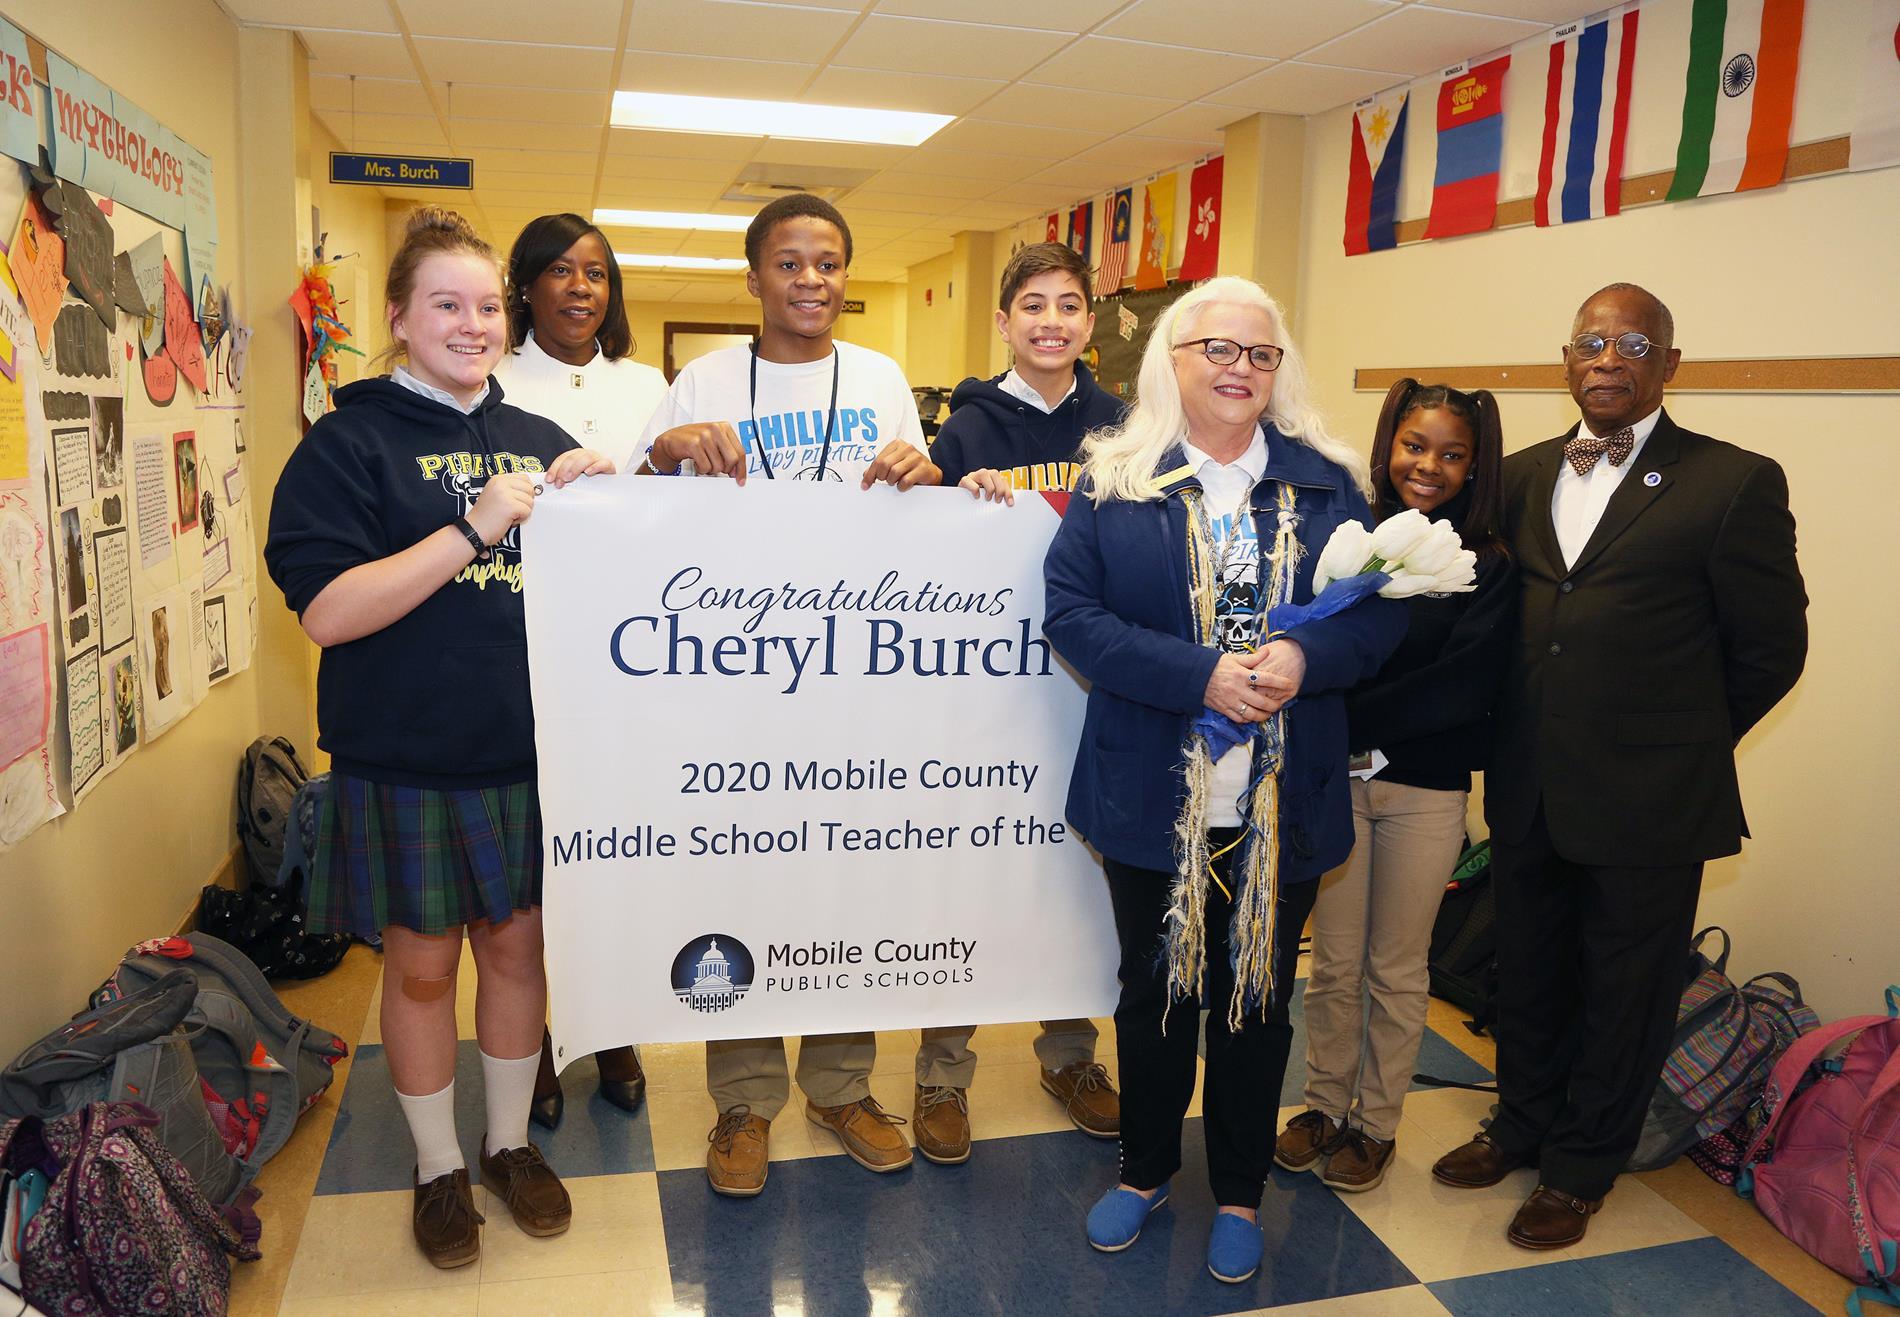 Cheryl Burch